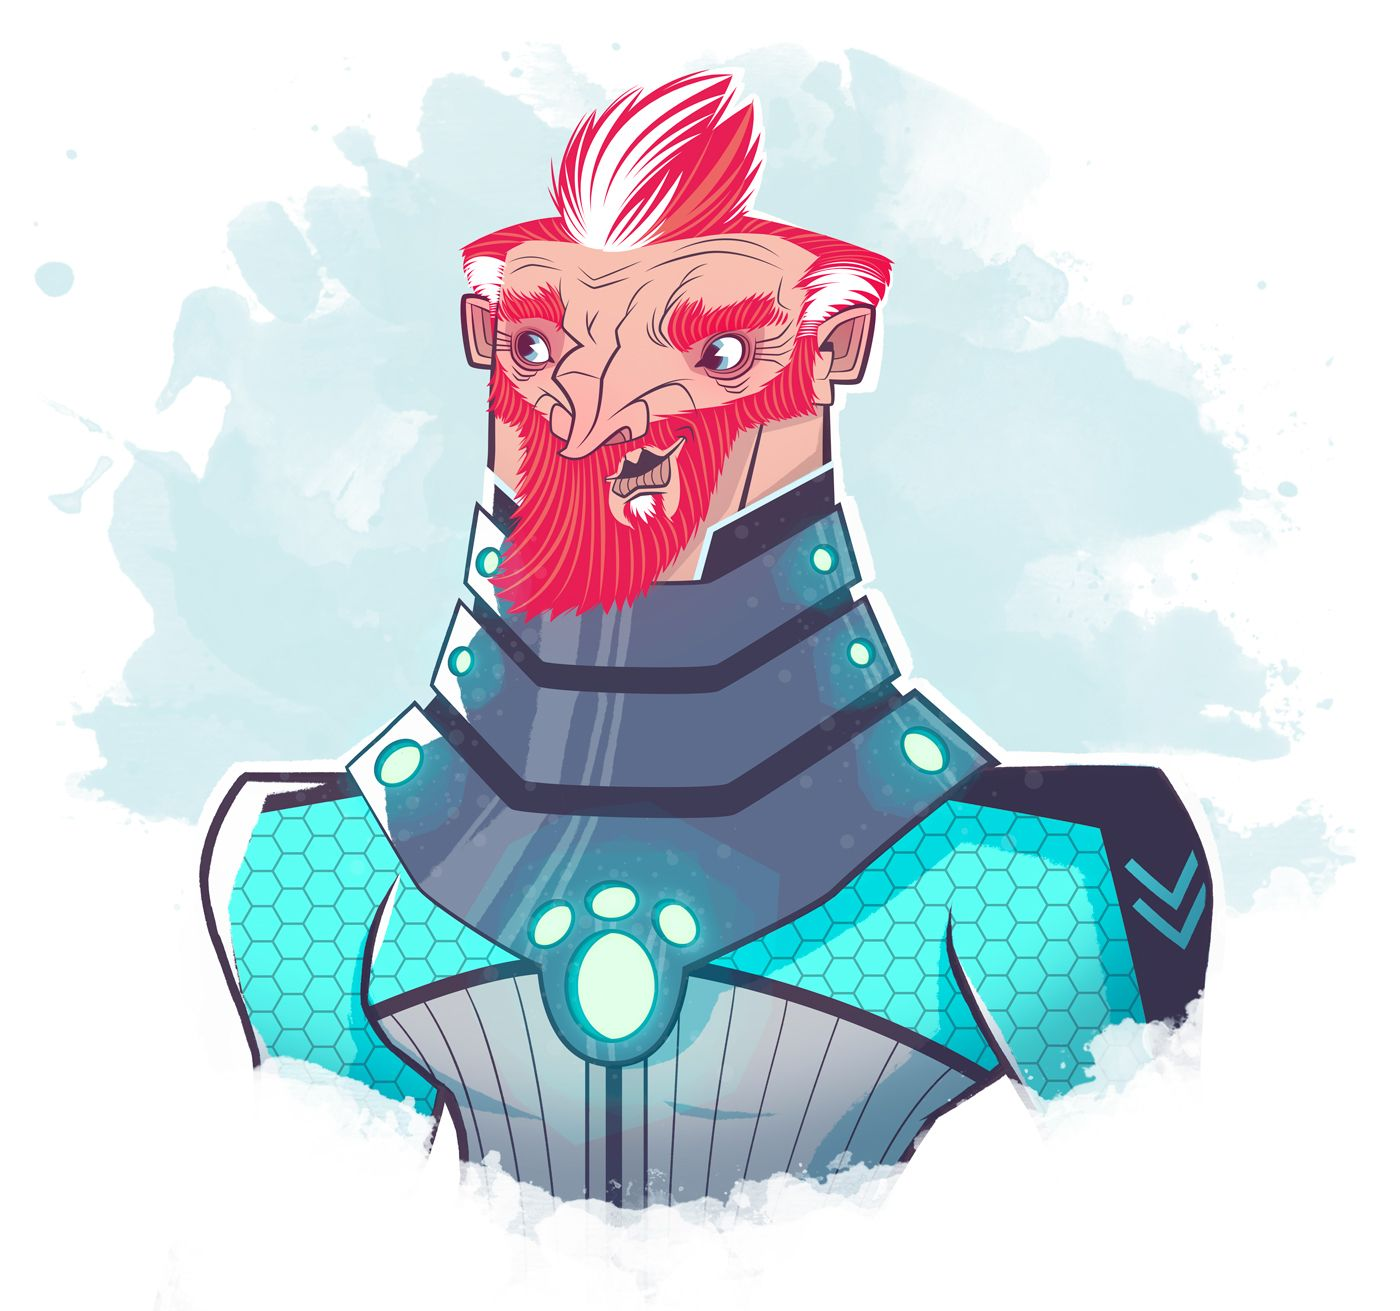 Captain Nemo | Character Design on Behance - Hector Borboa